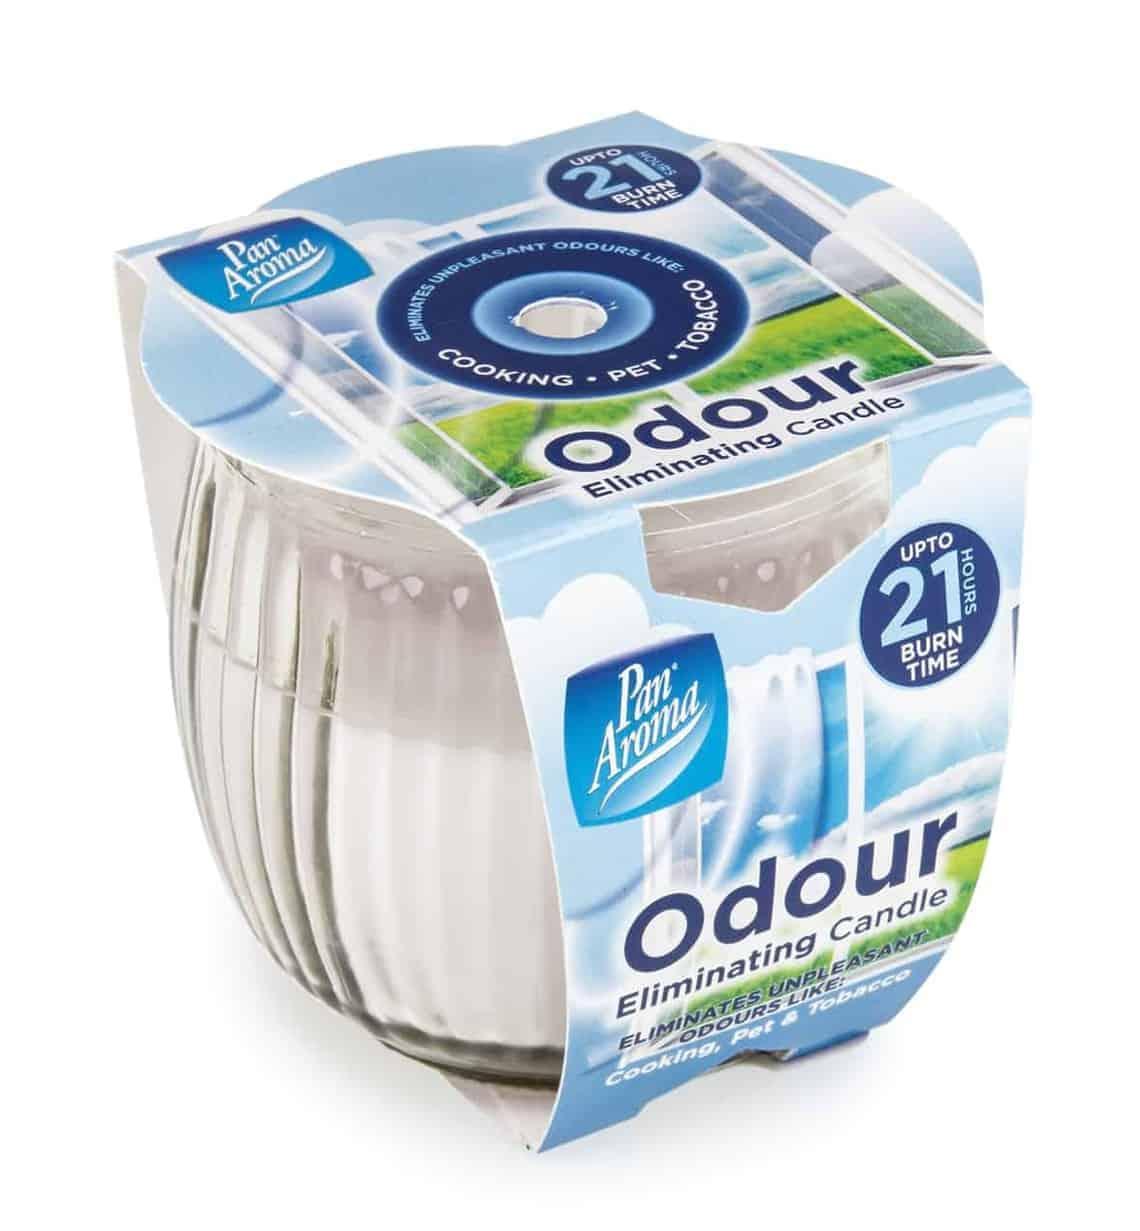 Pan Aroma Odour Eliminating Pot Candle